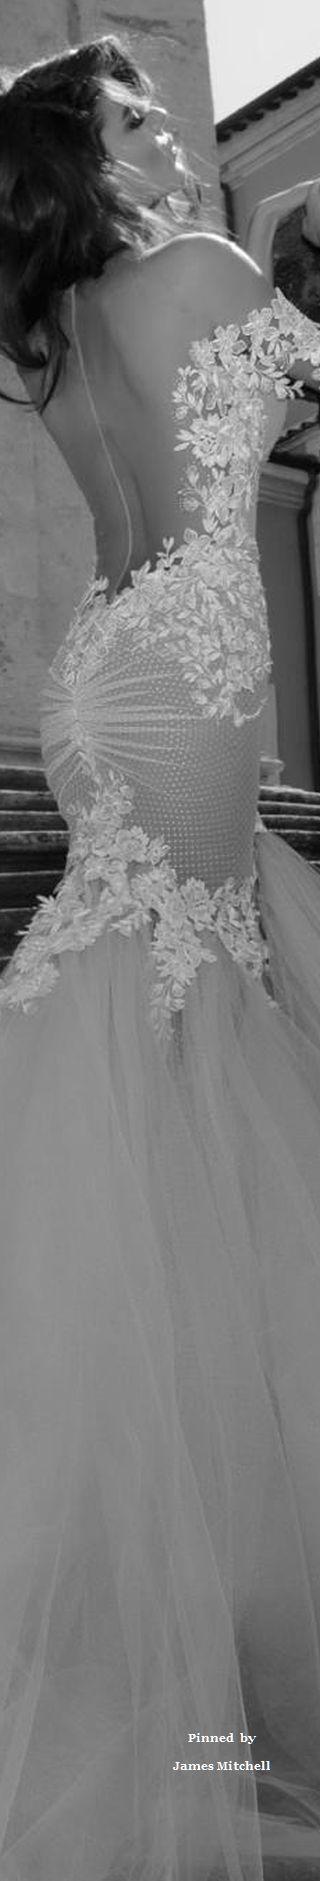 Roma spring 2017 bridal